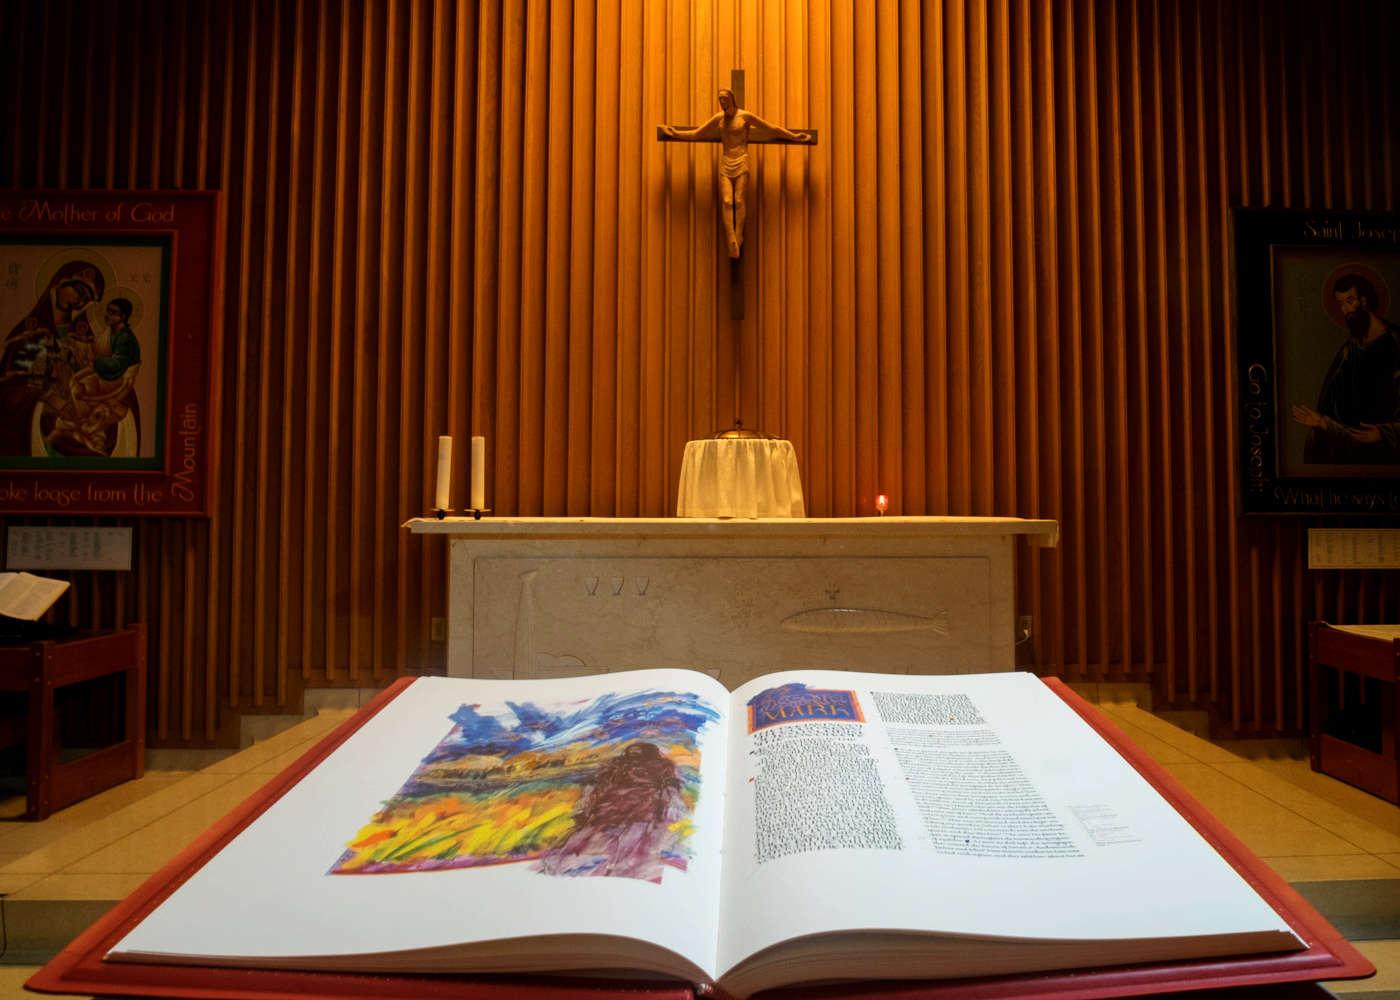 The Saint John's Bible